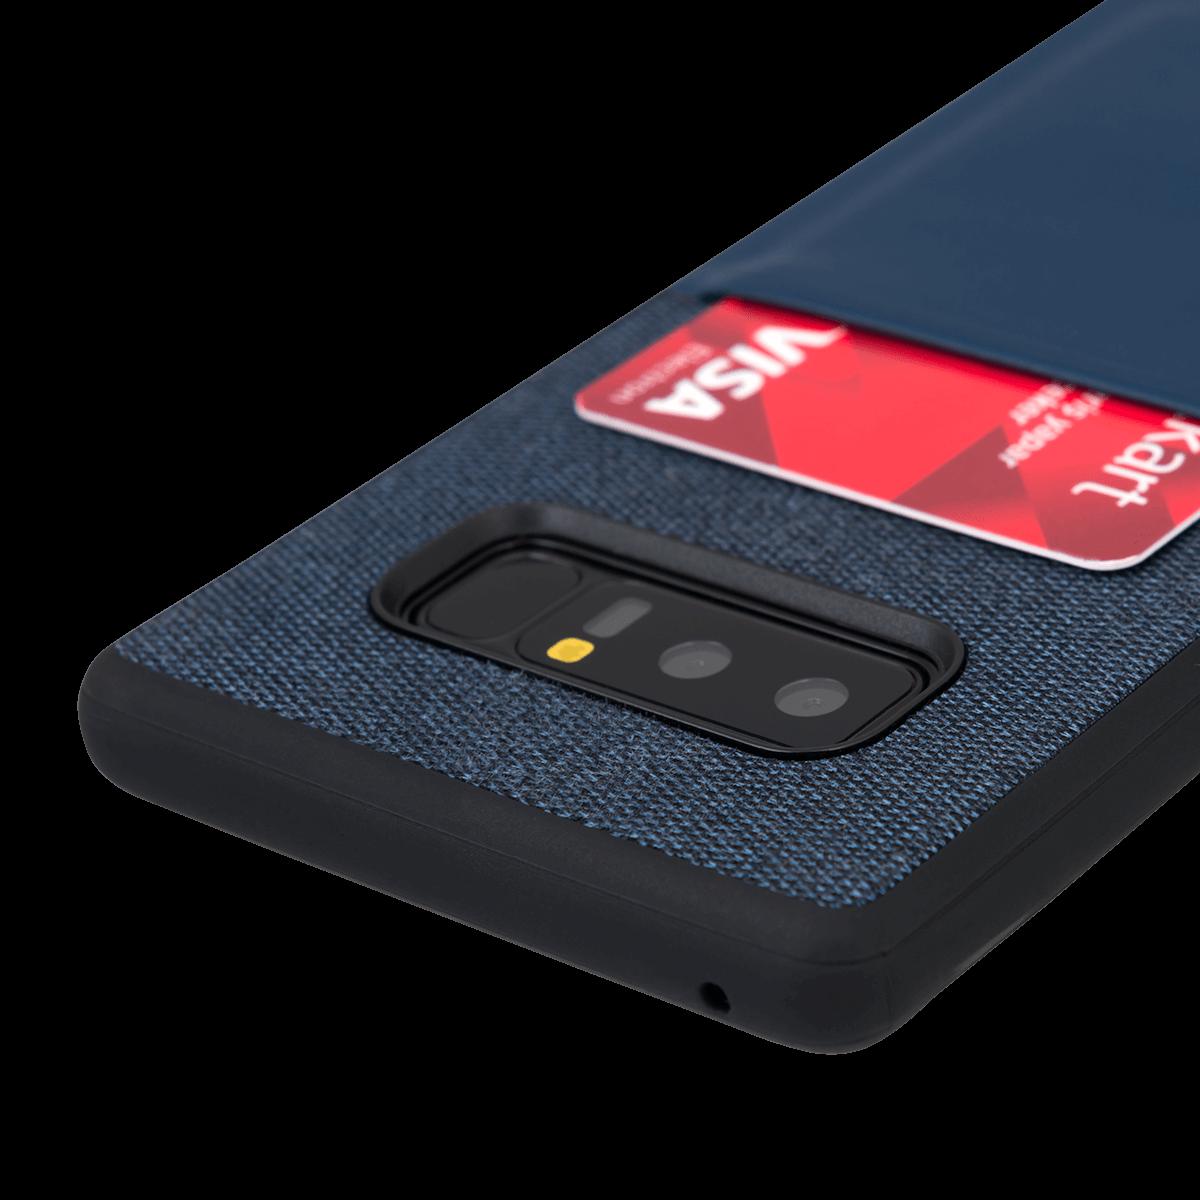 Samsung Note 8 için spada Fashion Pocket Lacivert renkli kapak